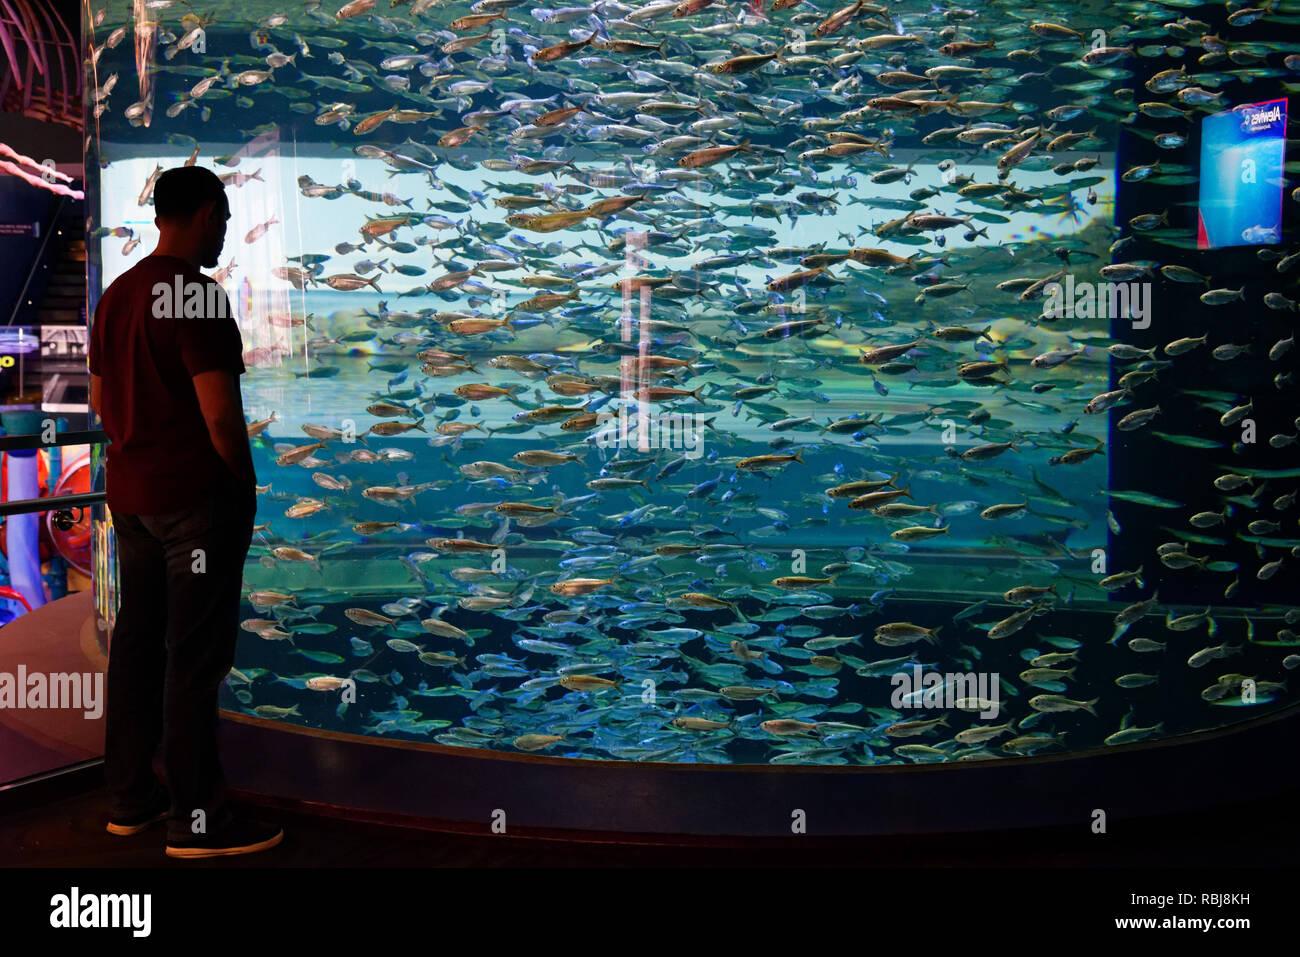 People looking at the Alewives (Alosa pseudoharengus) inside Ripley's Aquarium of Canada, Toronto, Ontario - Stock Image